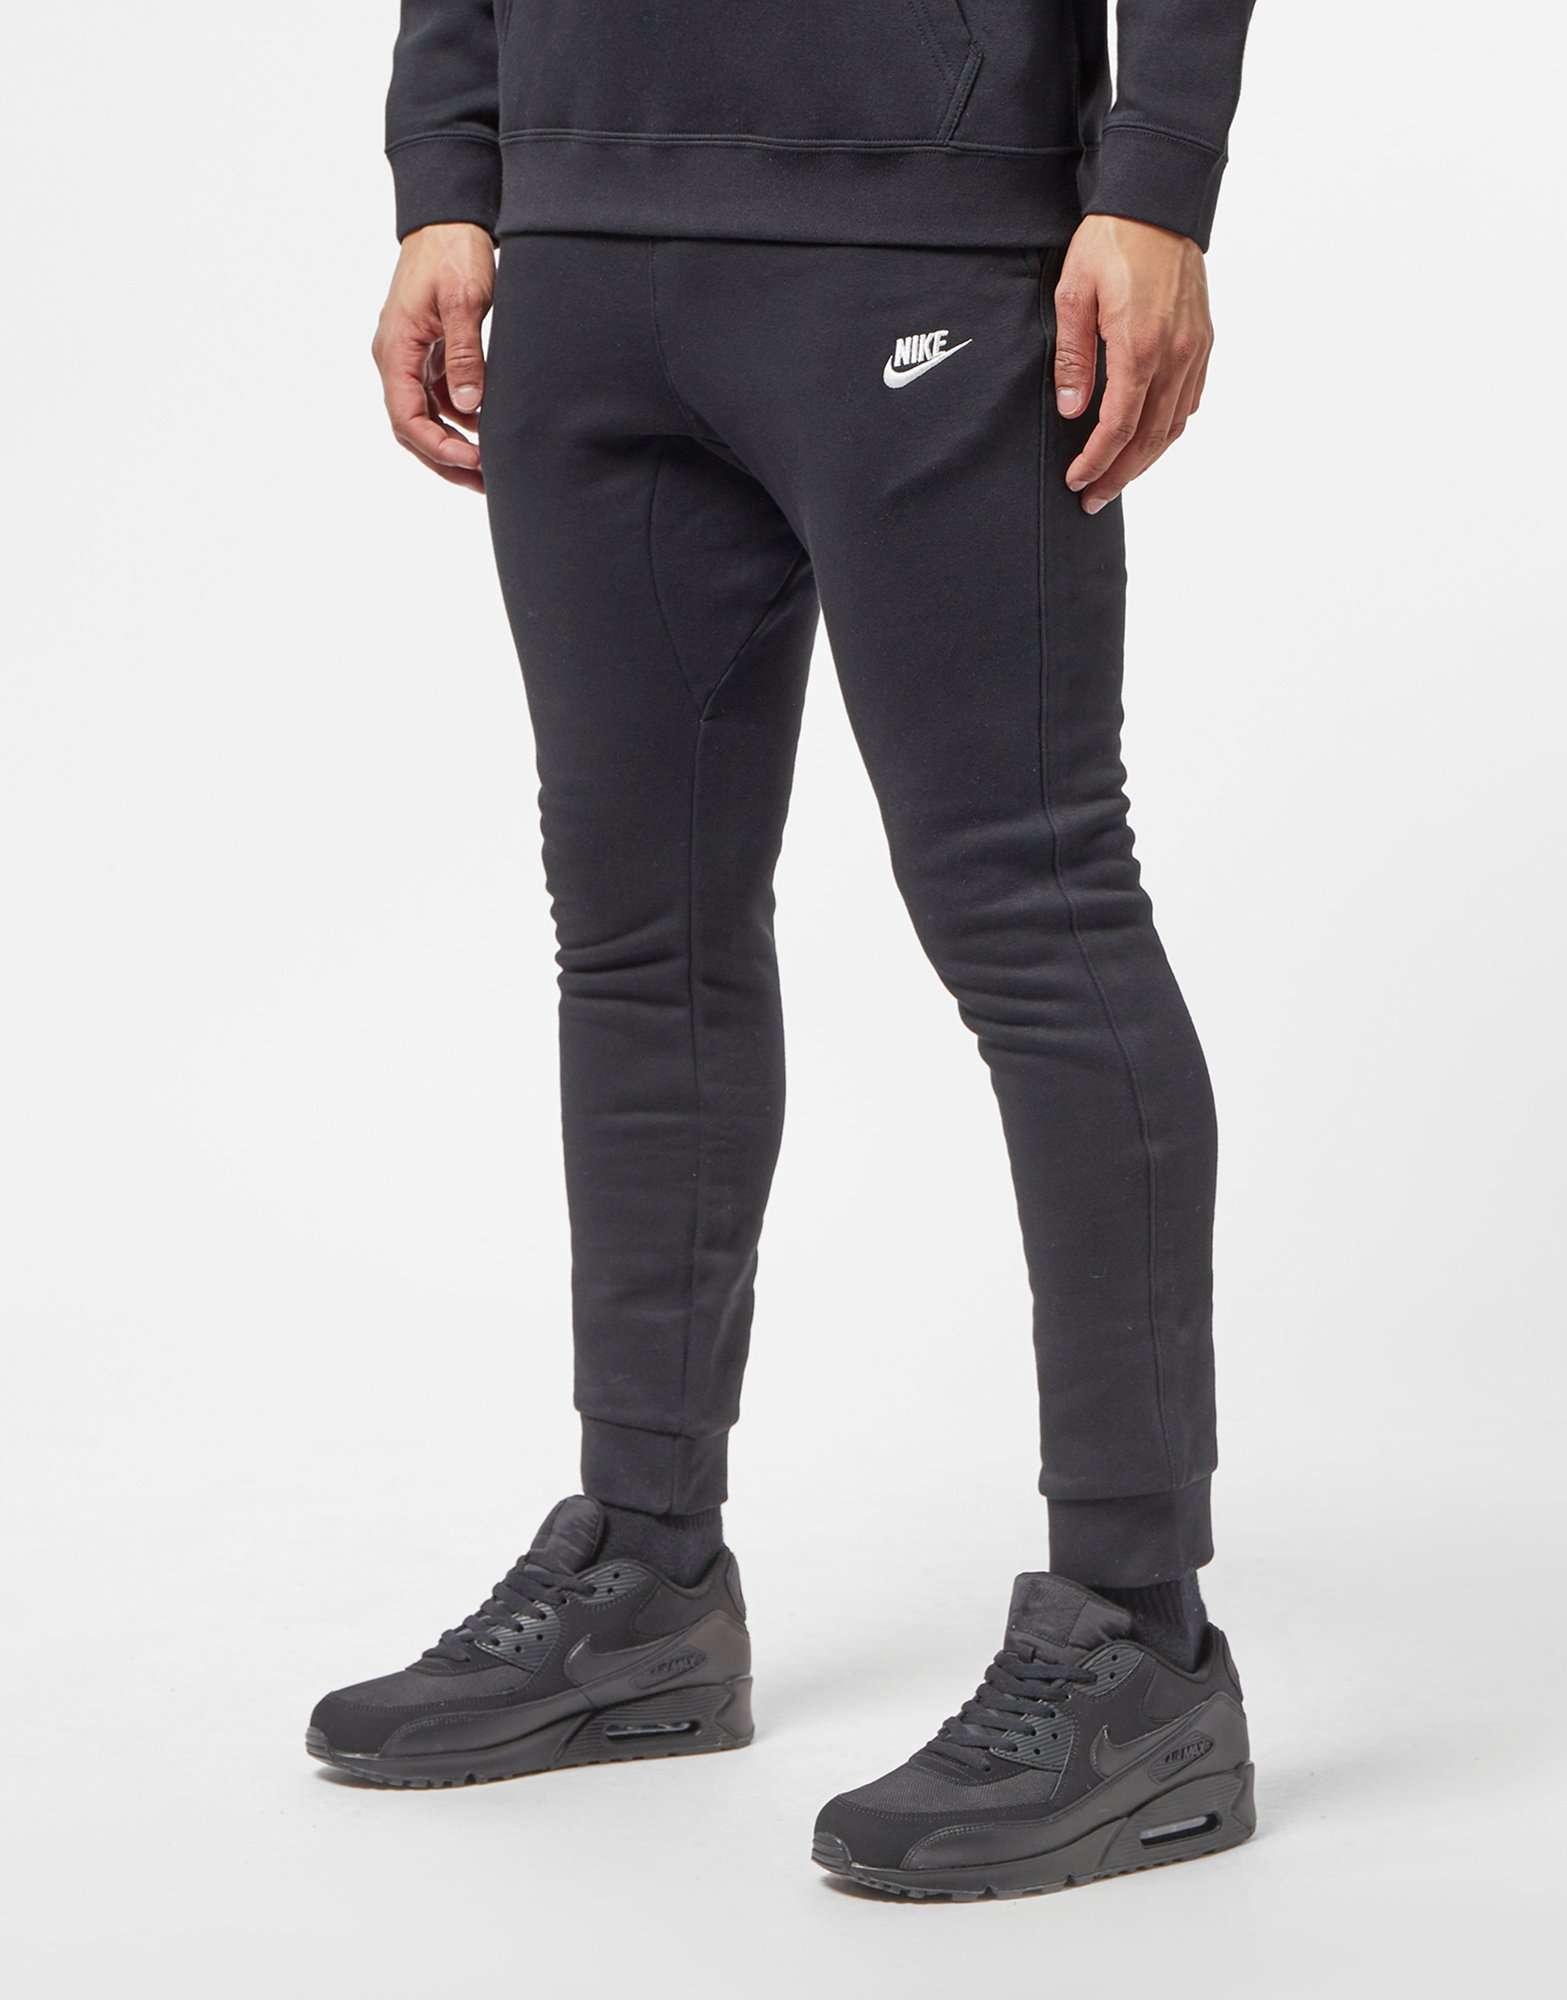 f7a23da9a8d6d Nike Foundation Cuffed Fleece Joggers | scotts Menswear